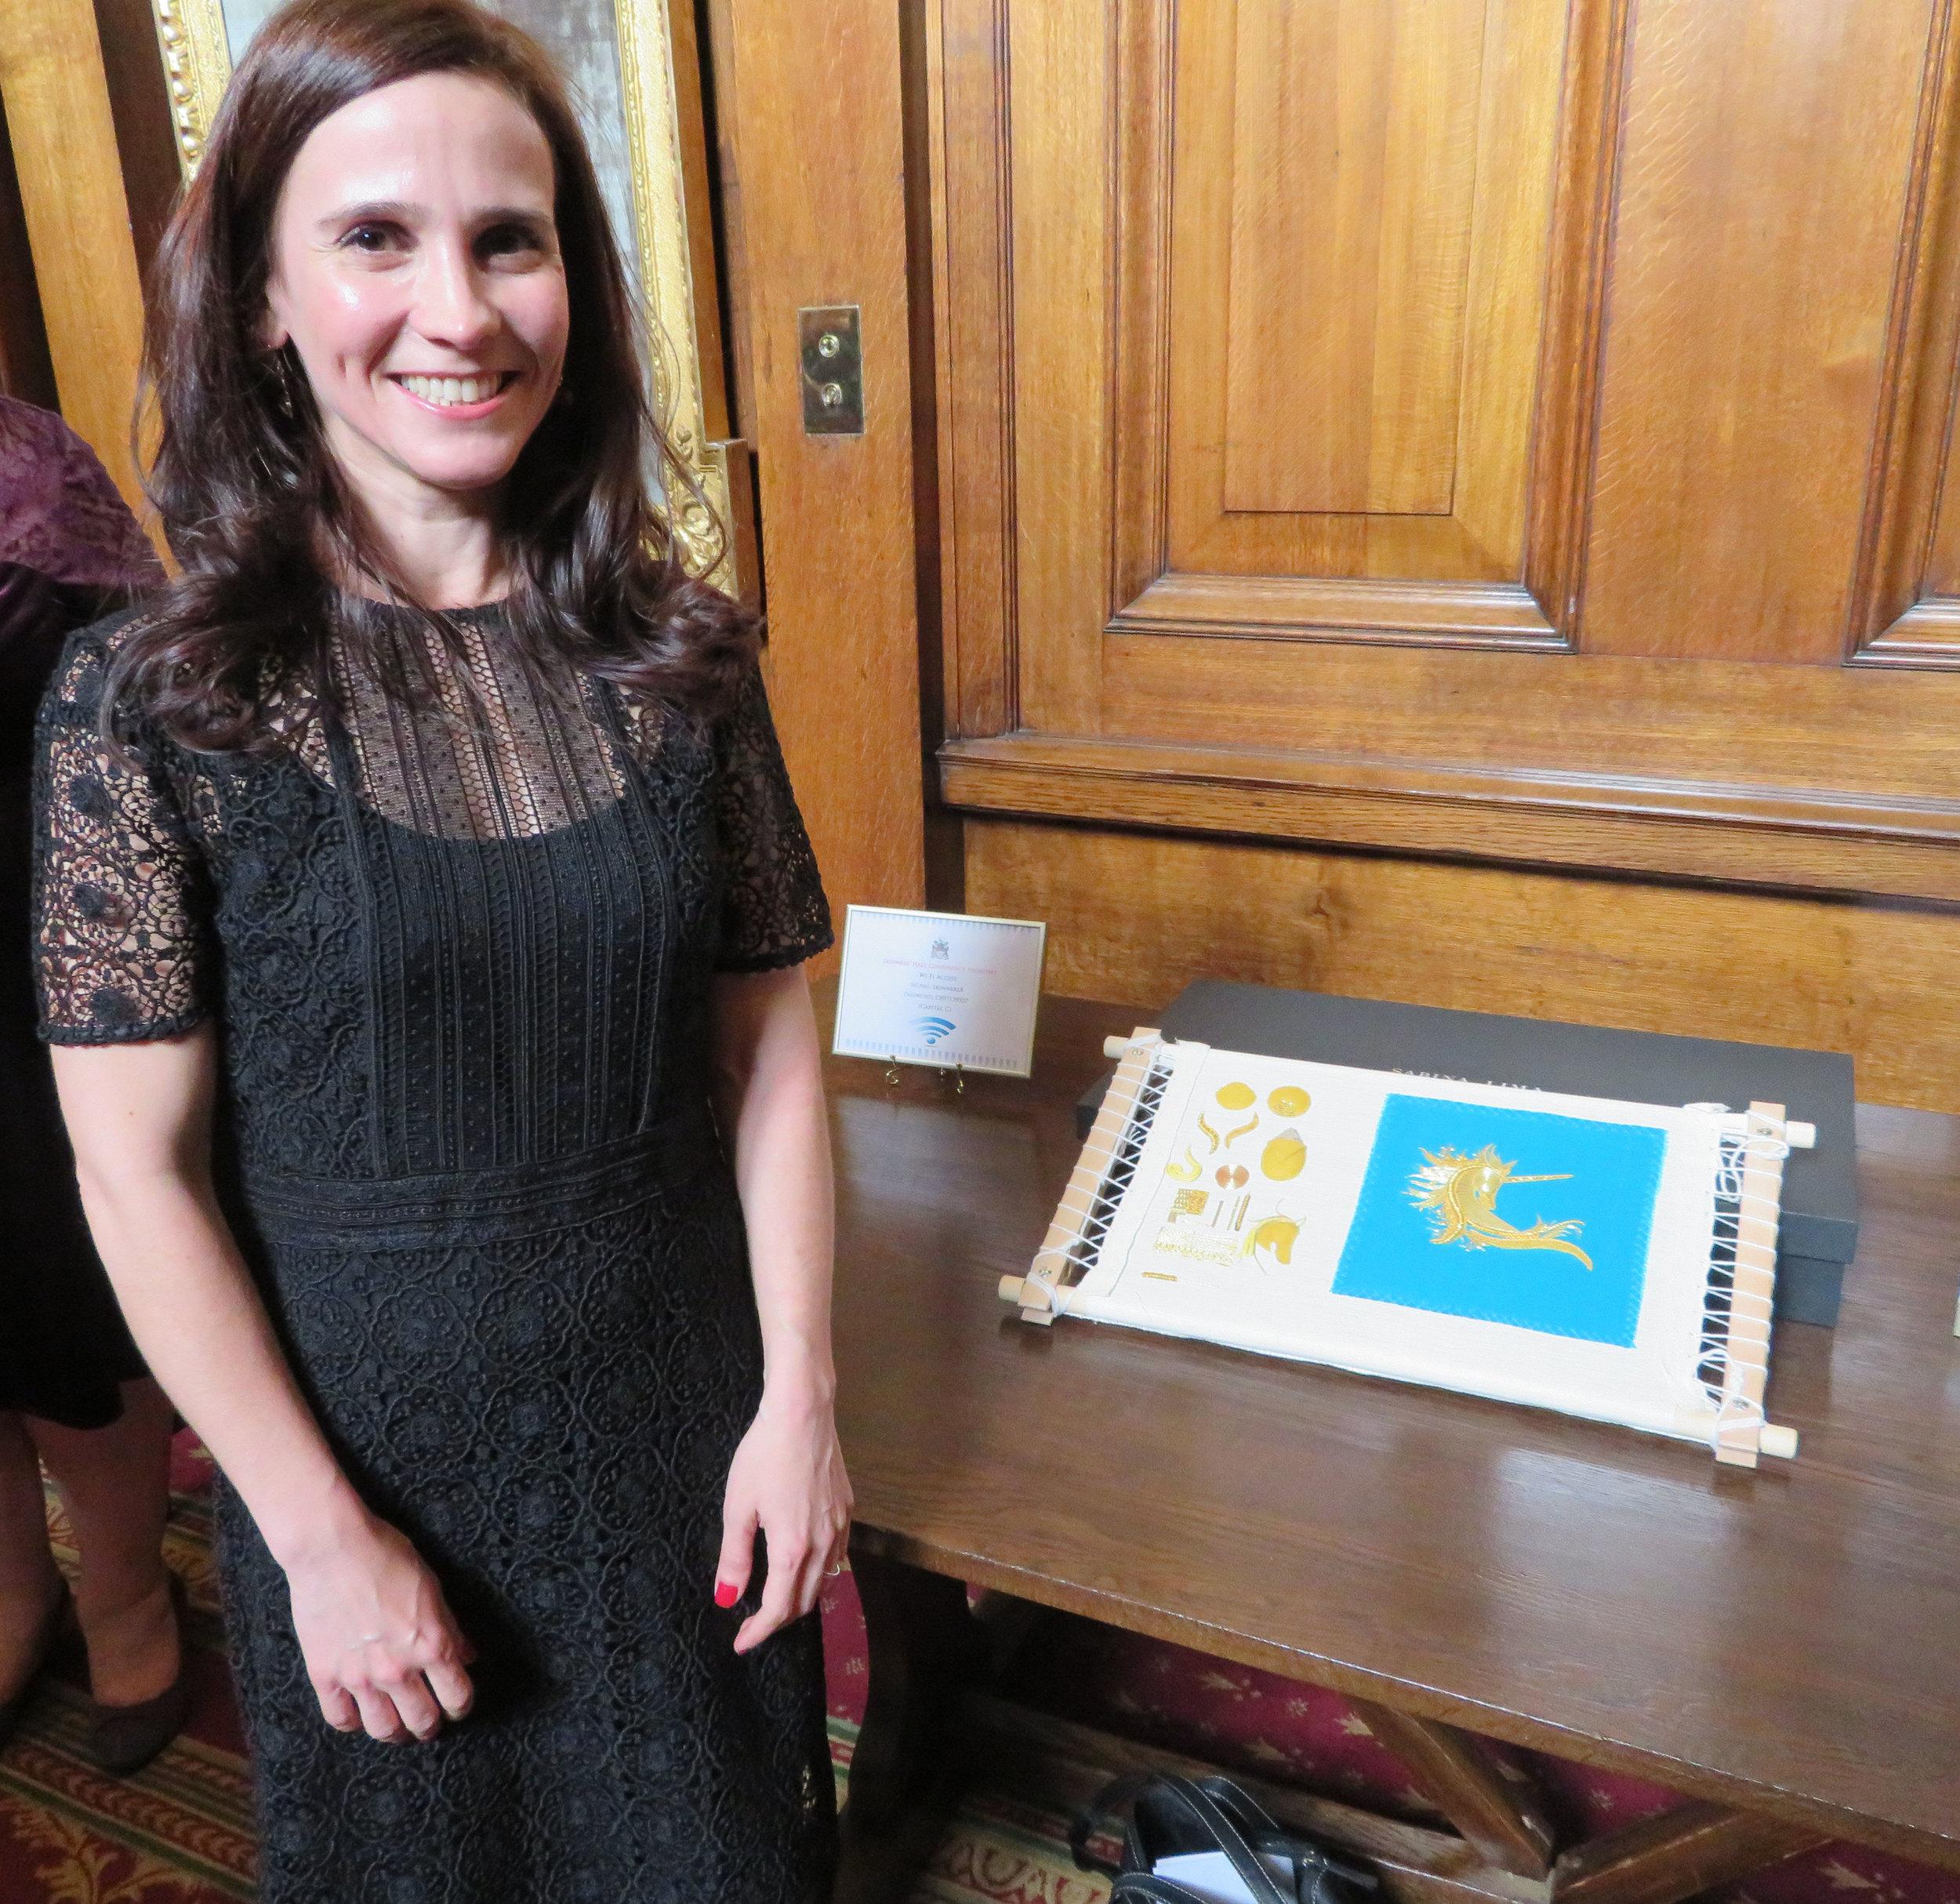 RSN Prize Winner Sabina Lima